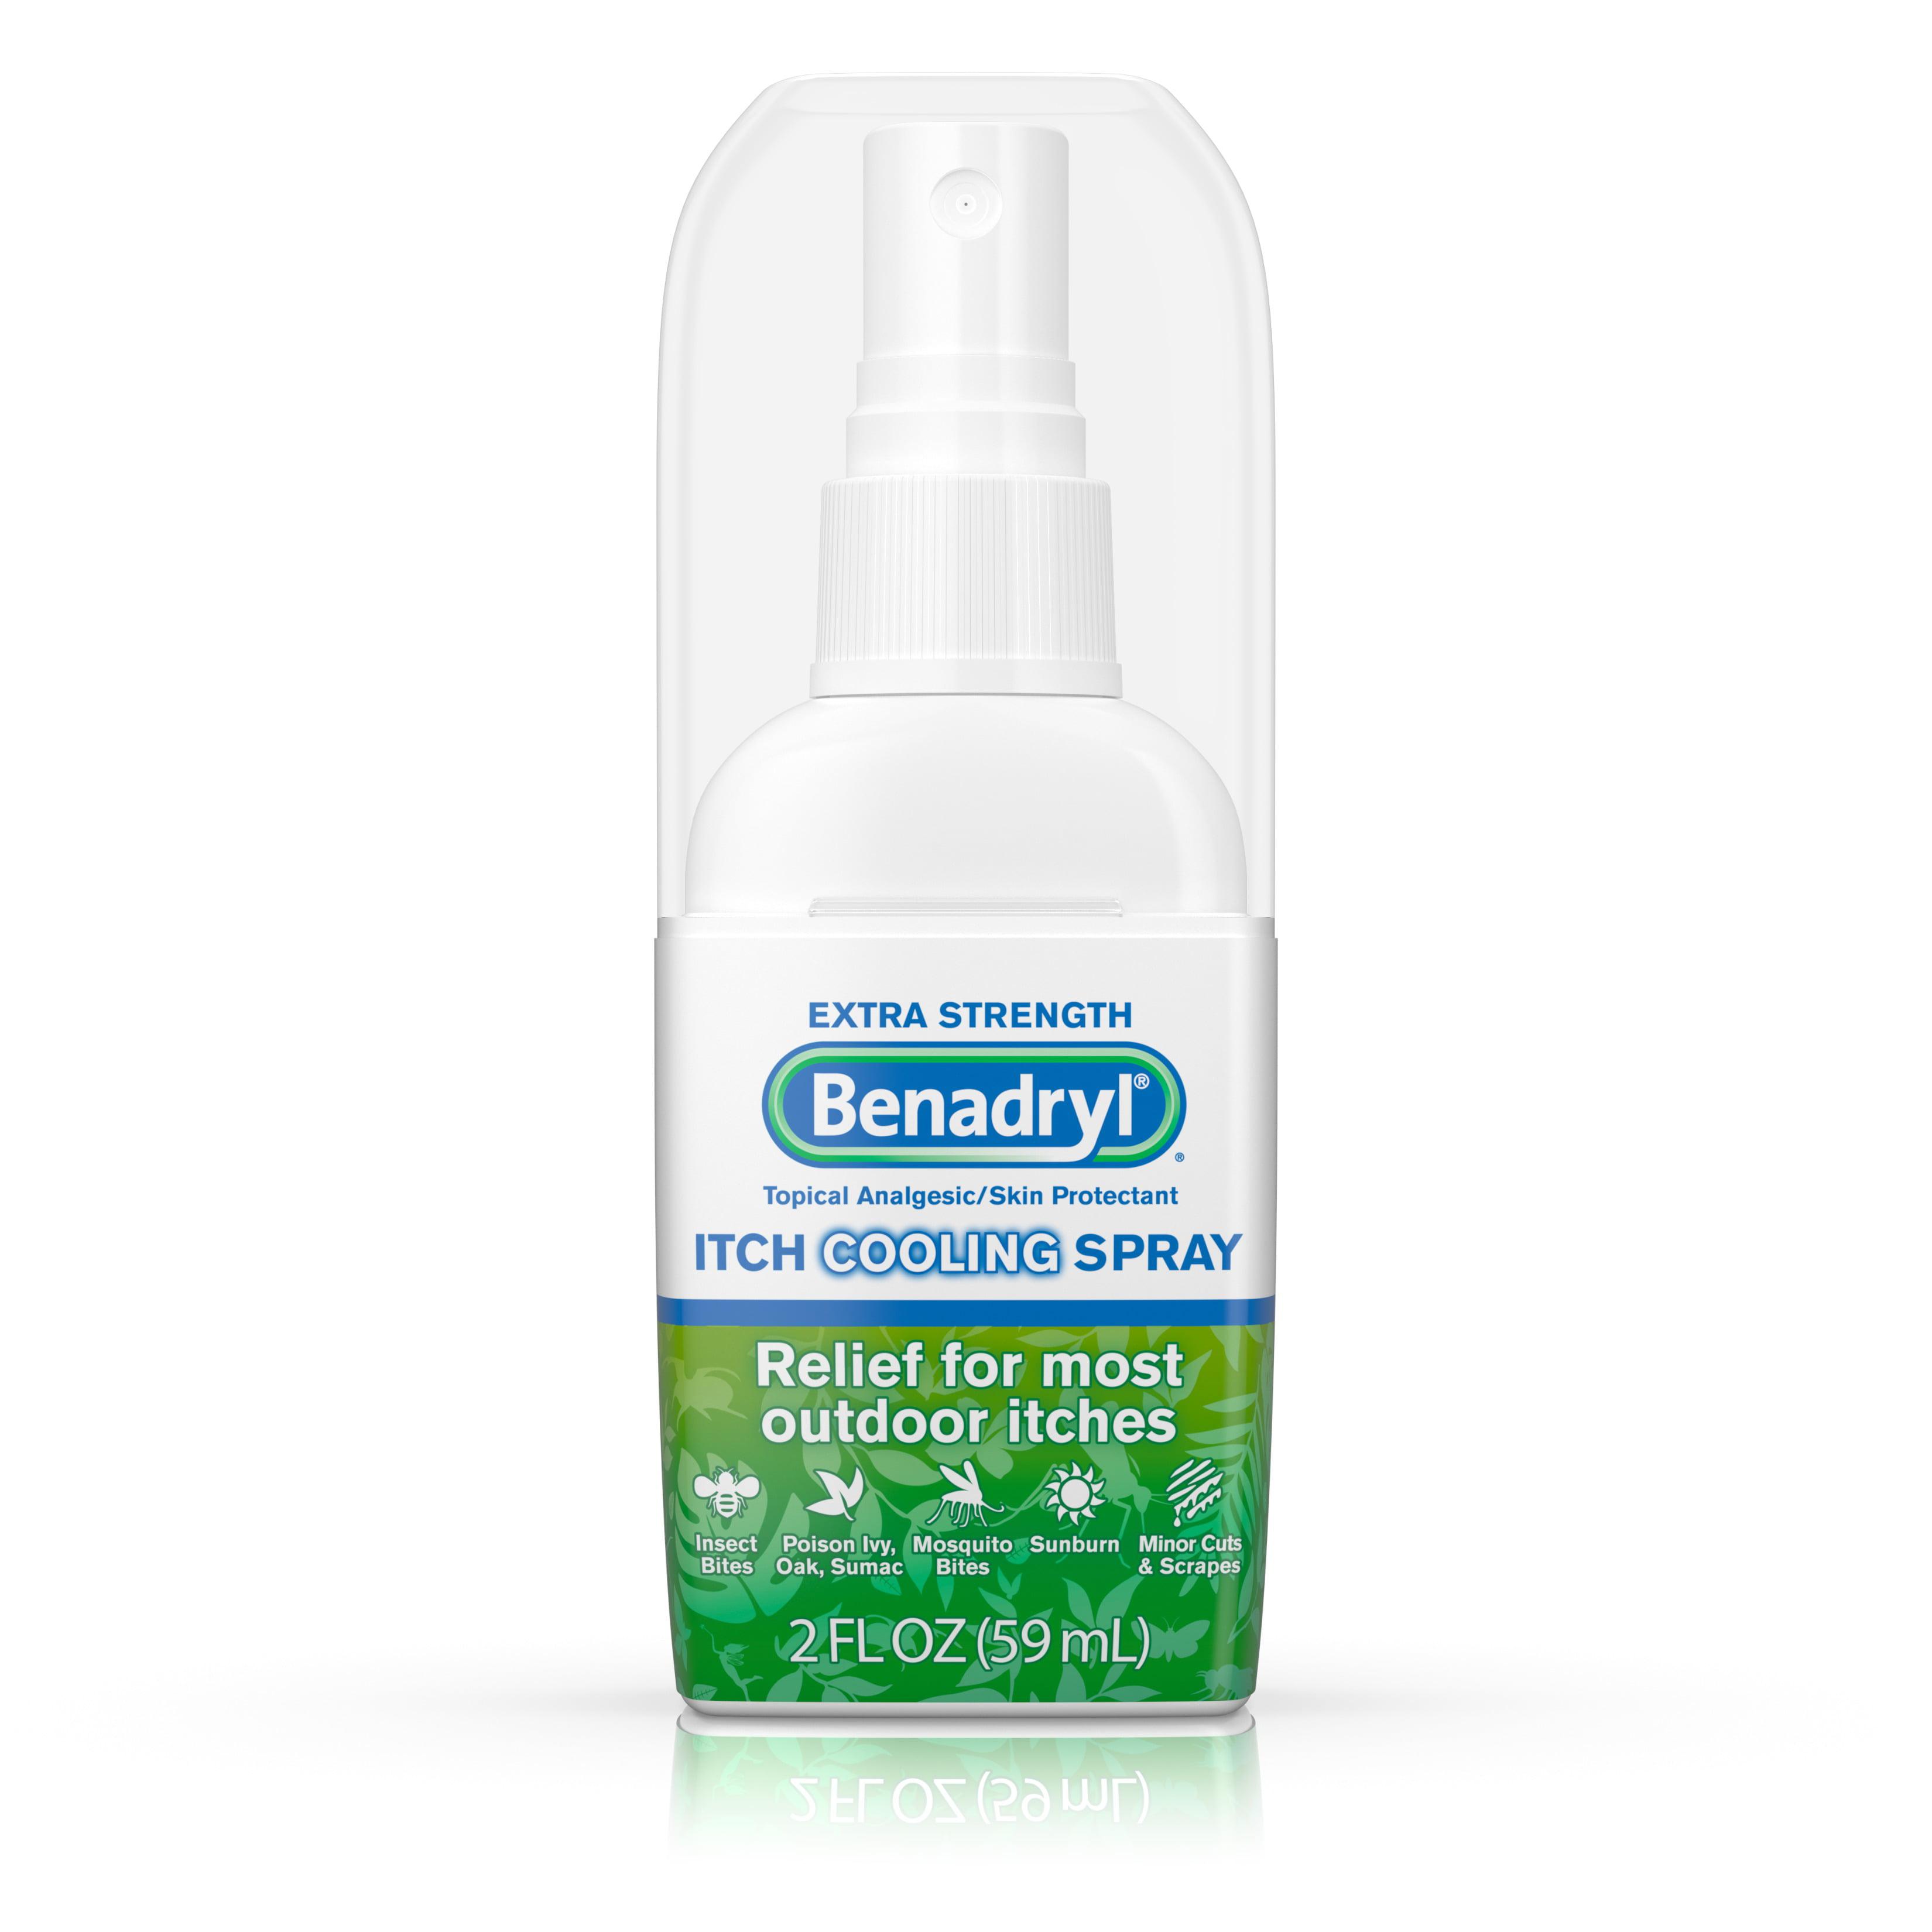 Benadryl Extra Strength Anti-Itch Cooling Spray, Travel Size, 2 fl. oz